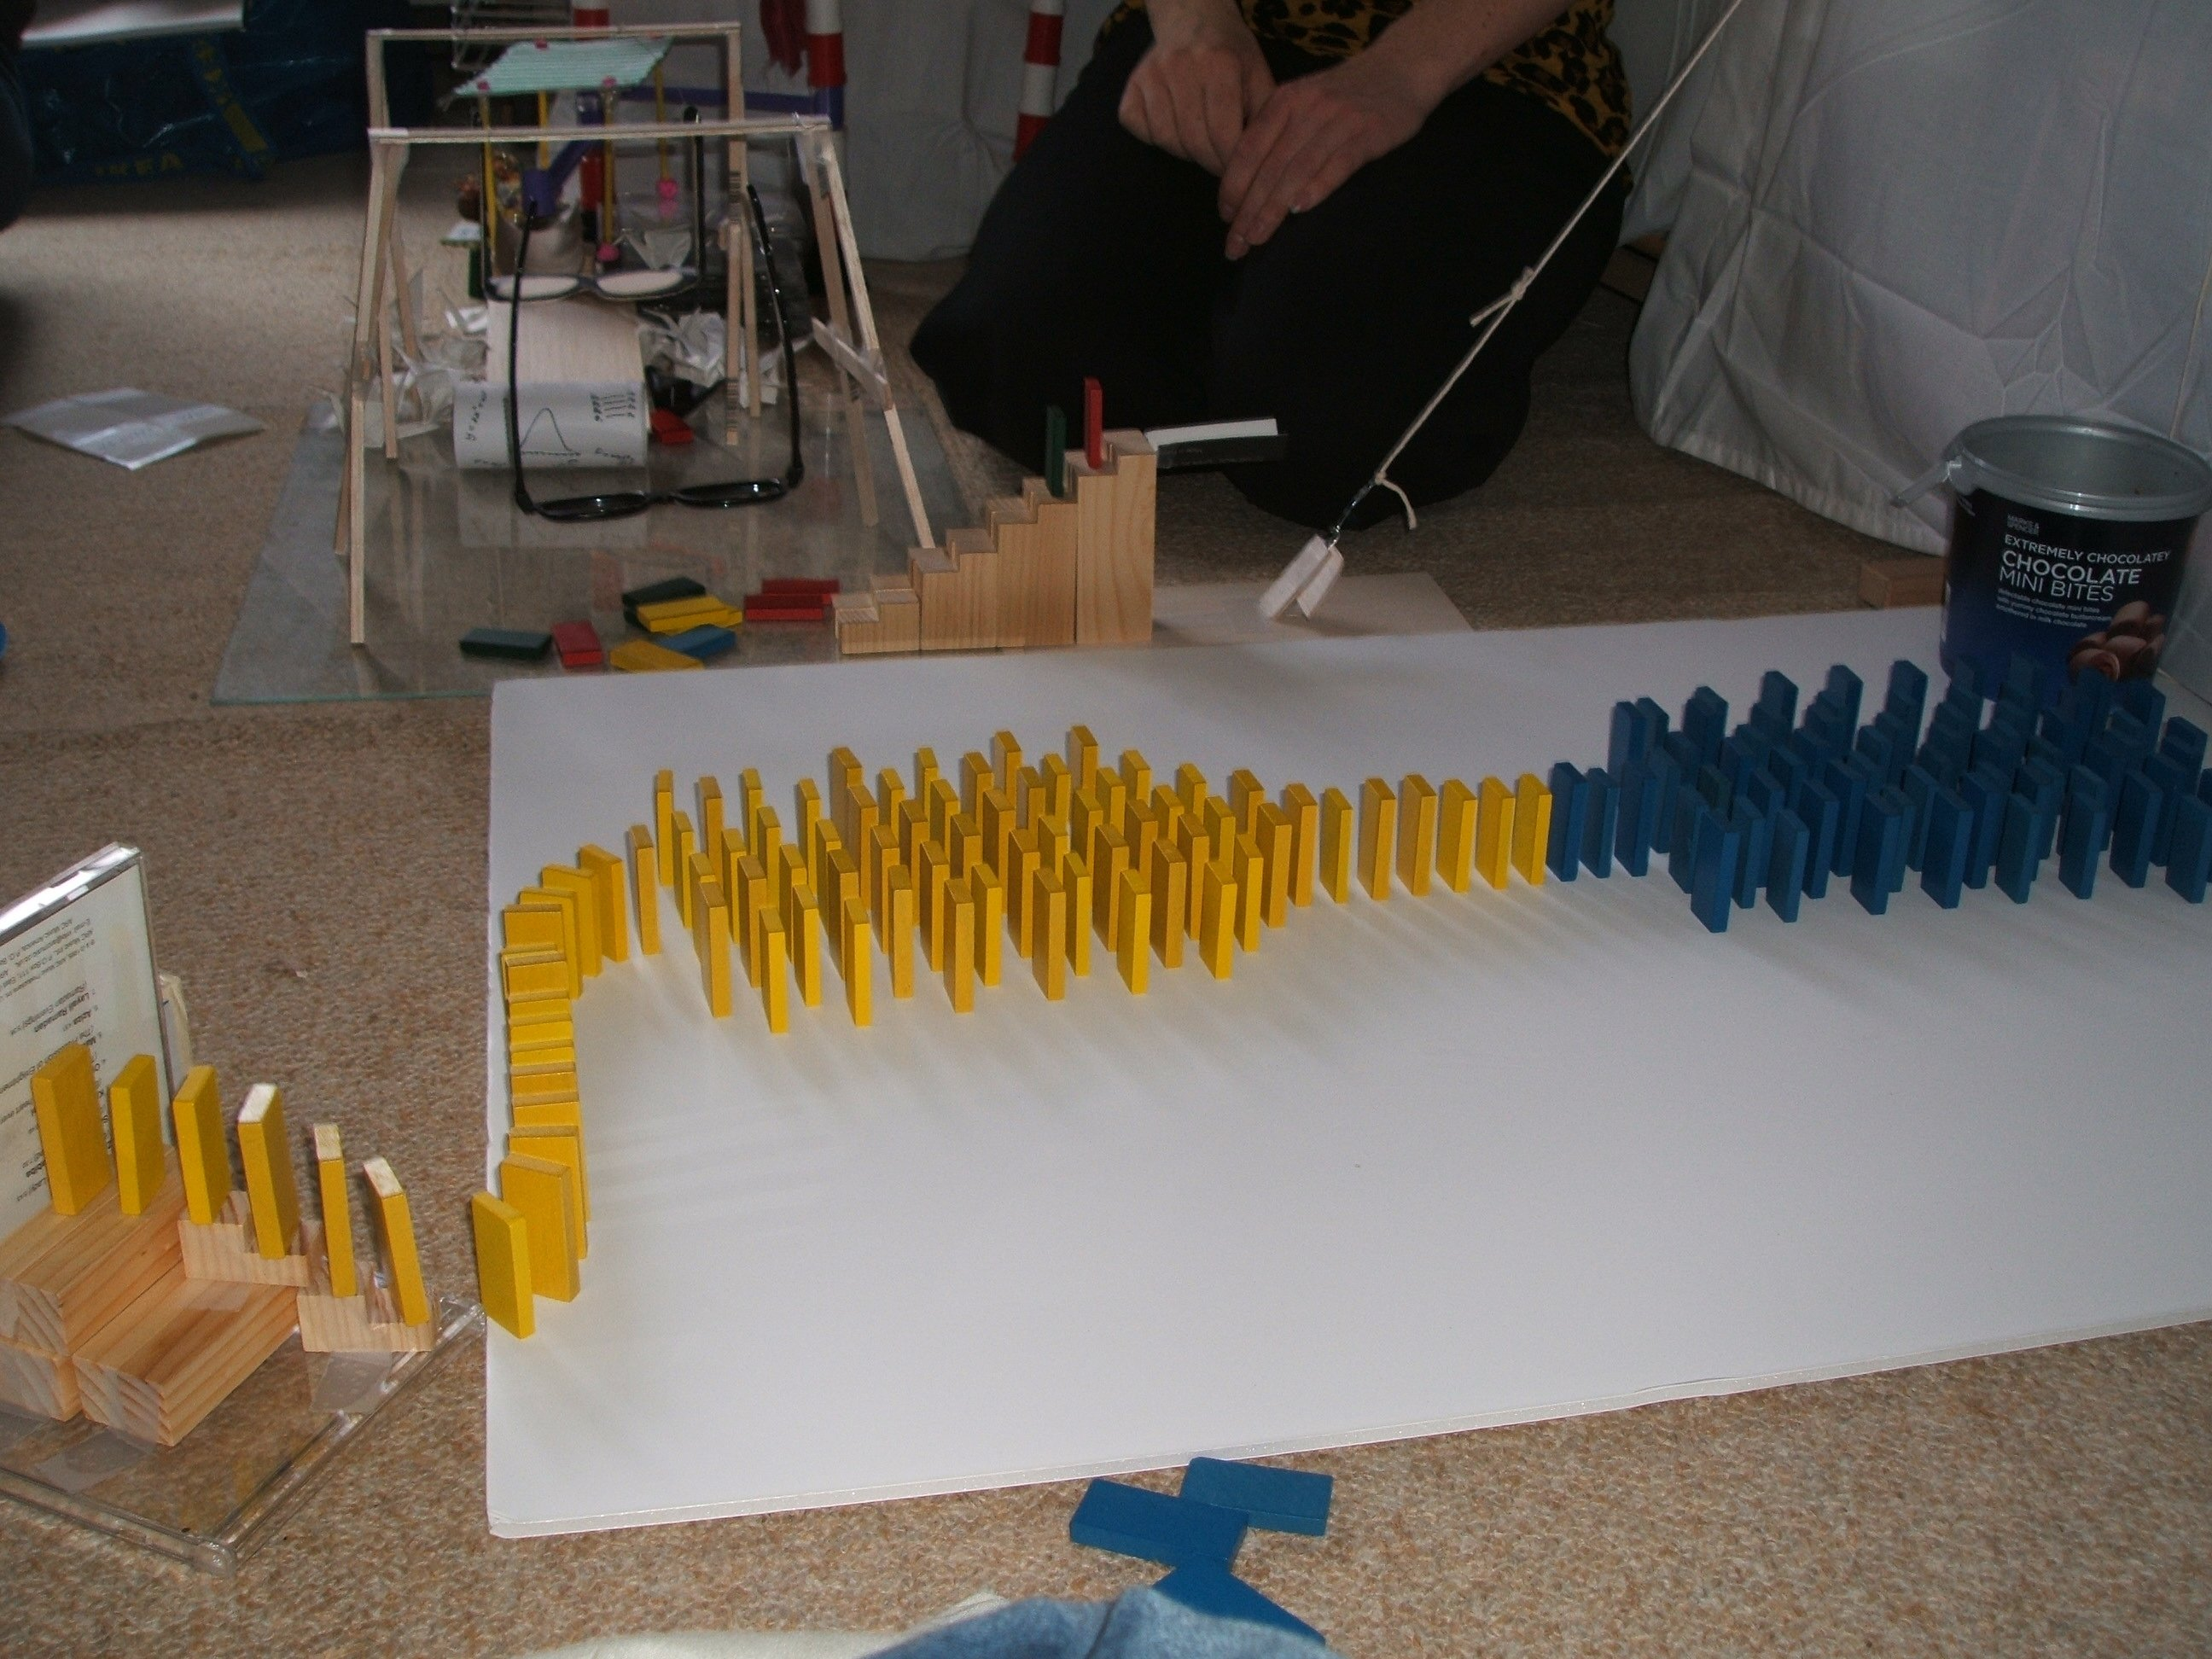 10 Lovely Ideas For A Rube Goldberg Machine building a rube goldberg machine jabberwacky 2020